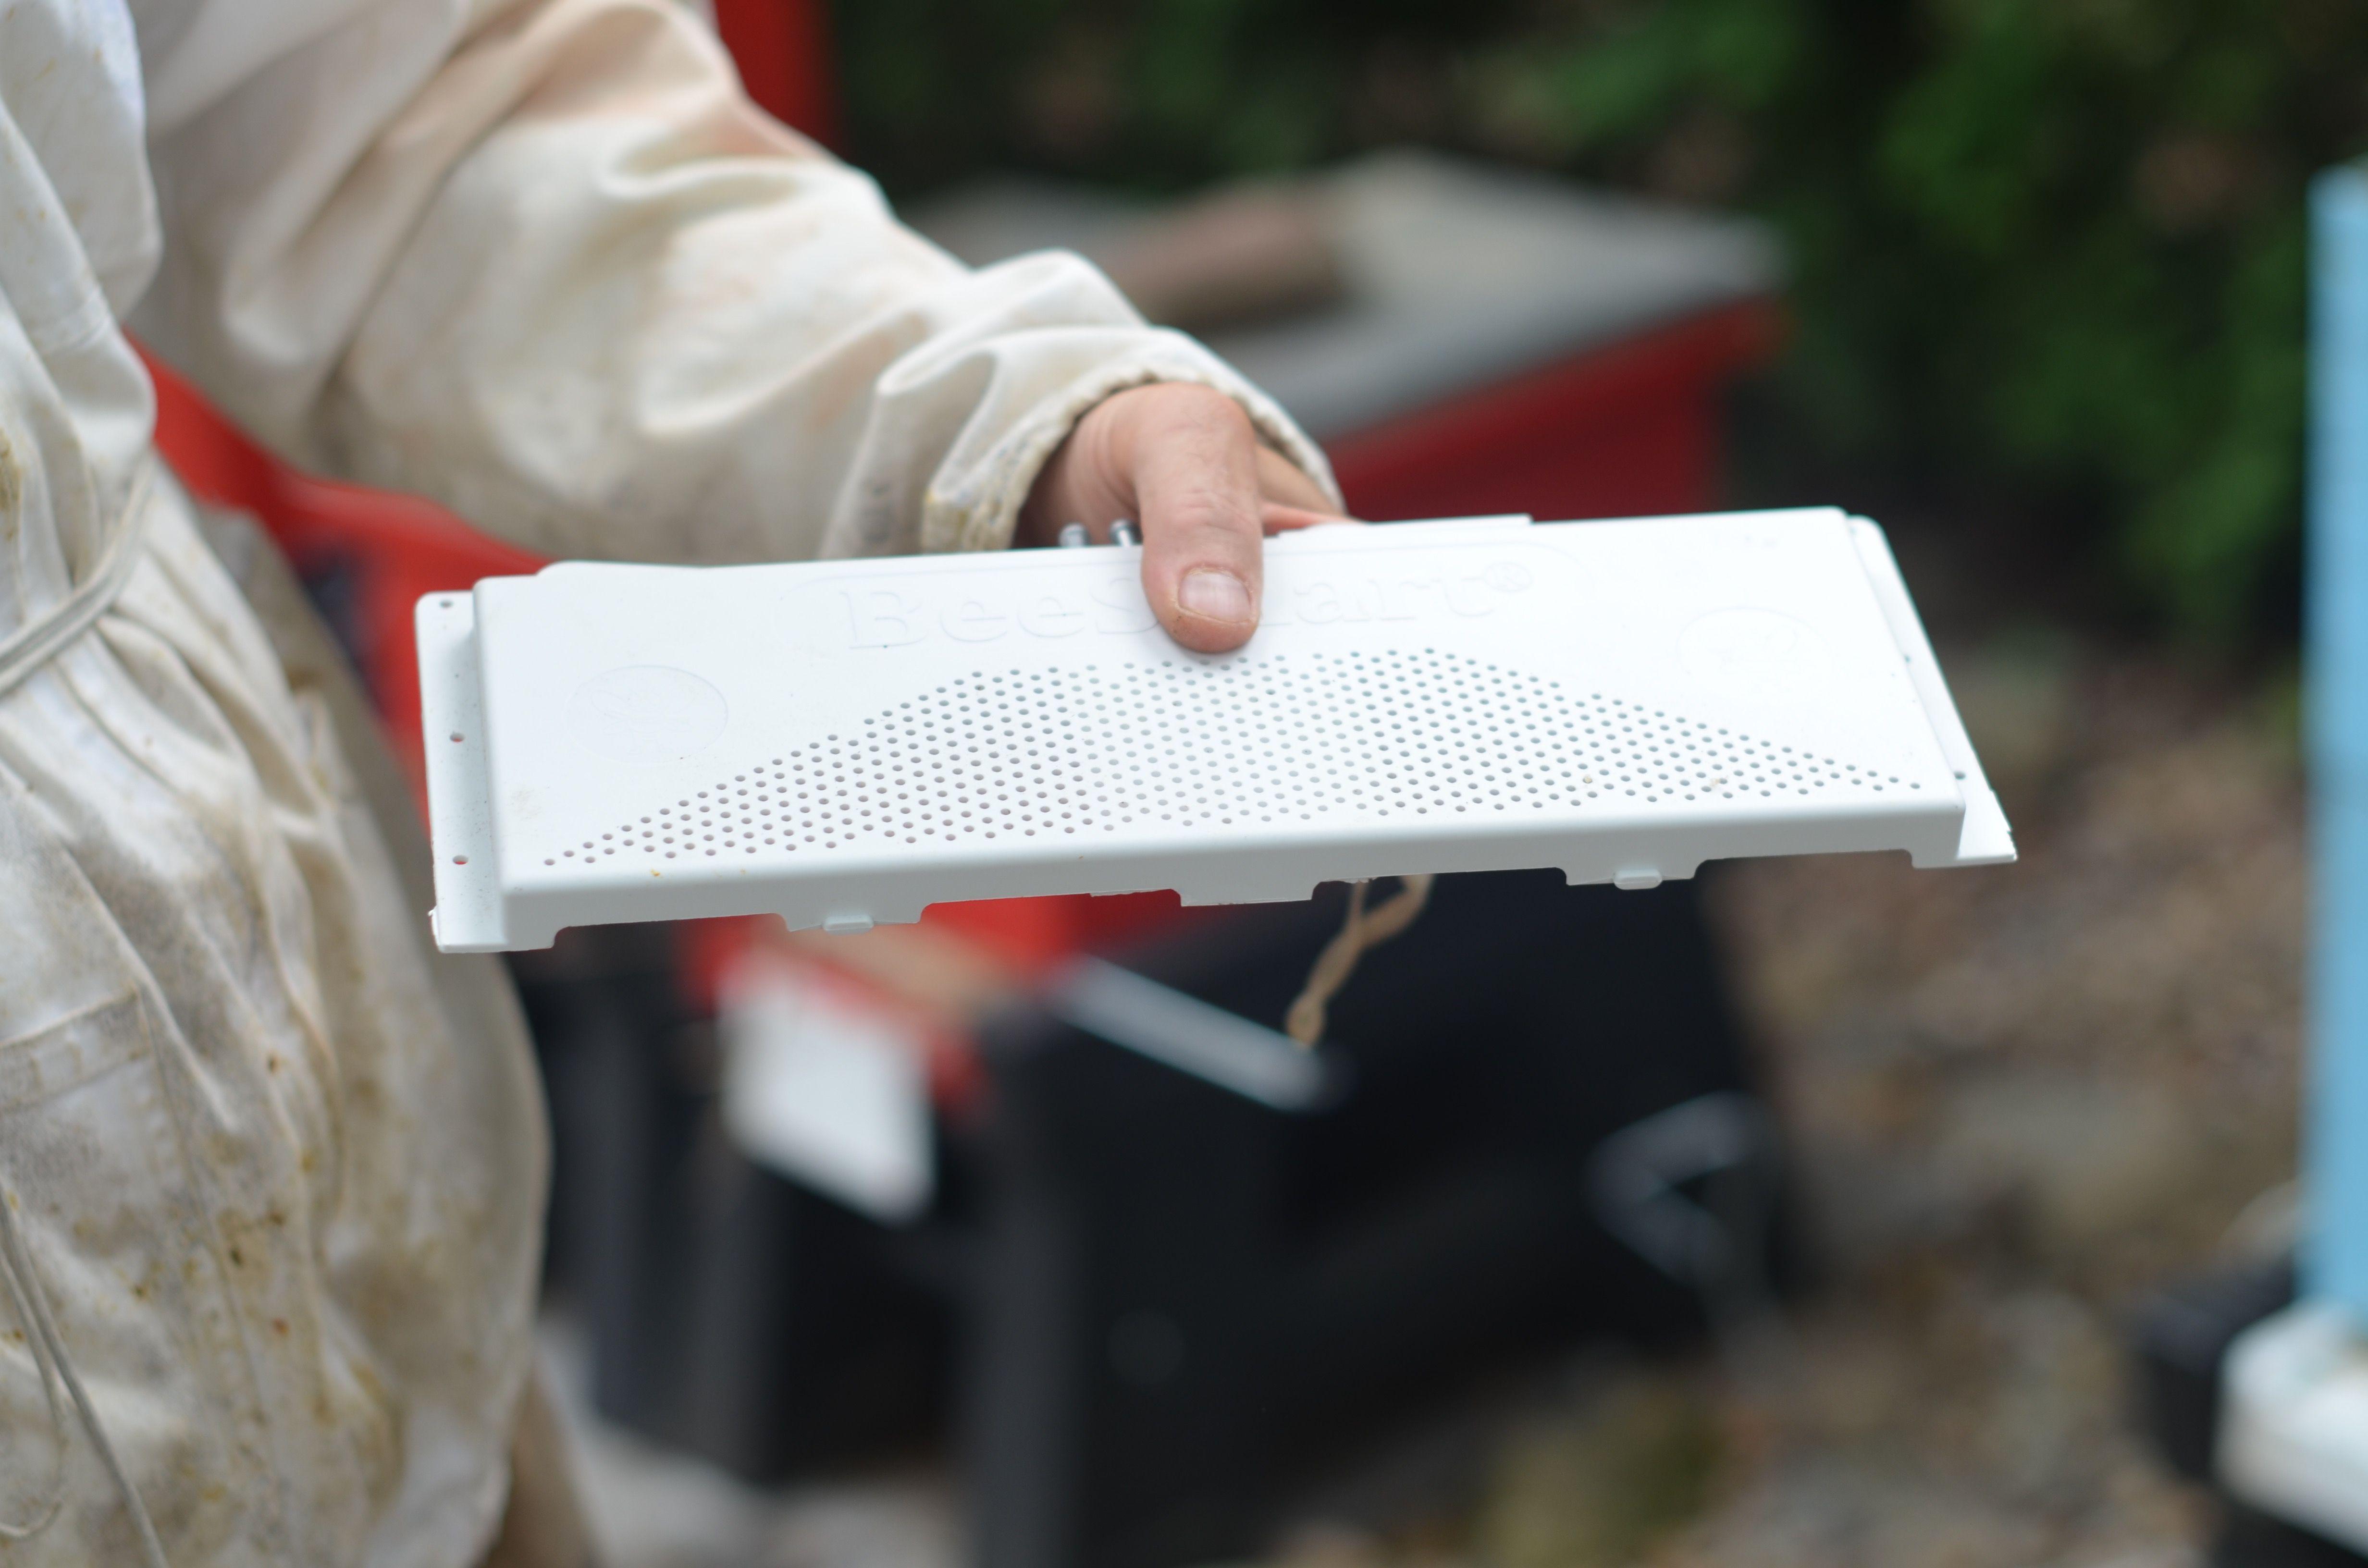 The Ultimate Robbing Screen has ventilation holes to keep hive orders low and robbers away from doors!  • • • • #bee #bees #beehive #honeybee #winter #winterbee #apiary #apiaries #beekeeper #beekeep #beekeeping #pollination #pollinate #honey #apiarist #beehive #queenbee #housebees #robbingscreen #screen #ventilation